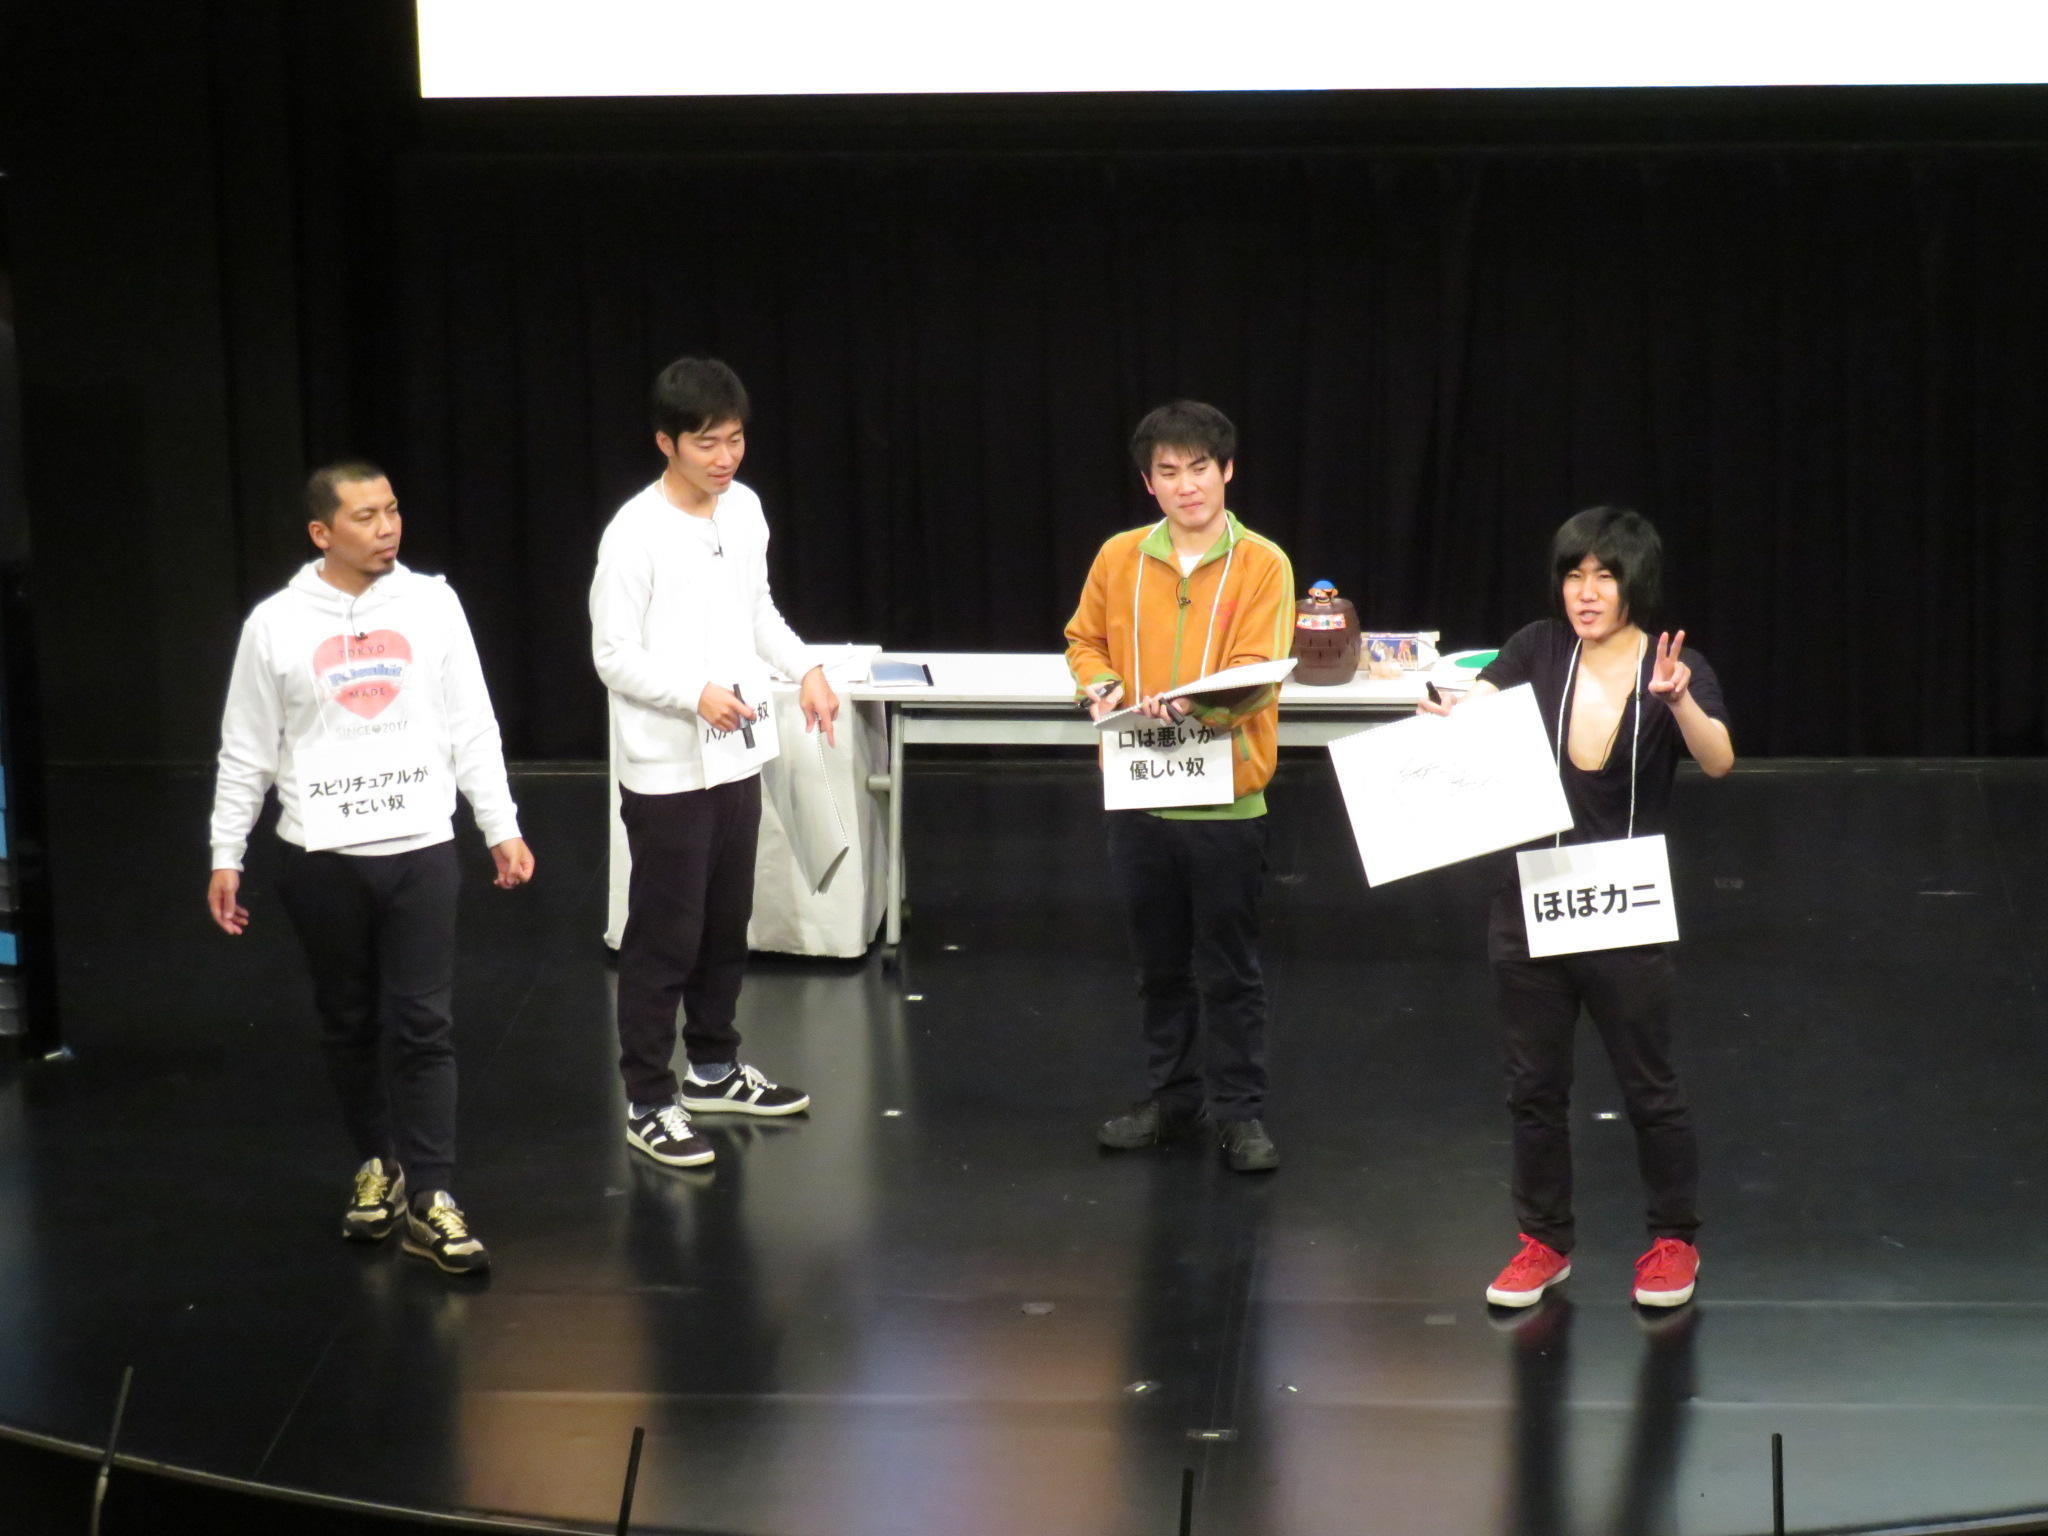 http://news.yoshimoto.co.jp/20181230125822-0410bae9702a6634d4e7c37ad12f95a64c9db8a9.jpg